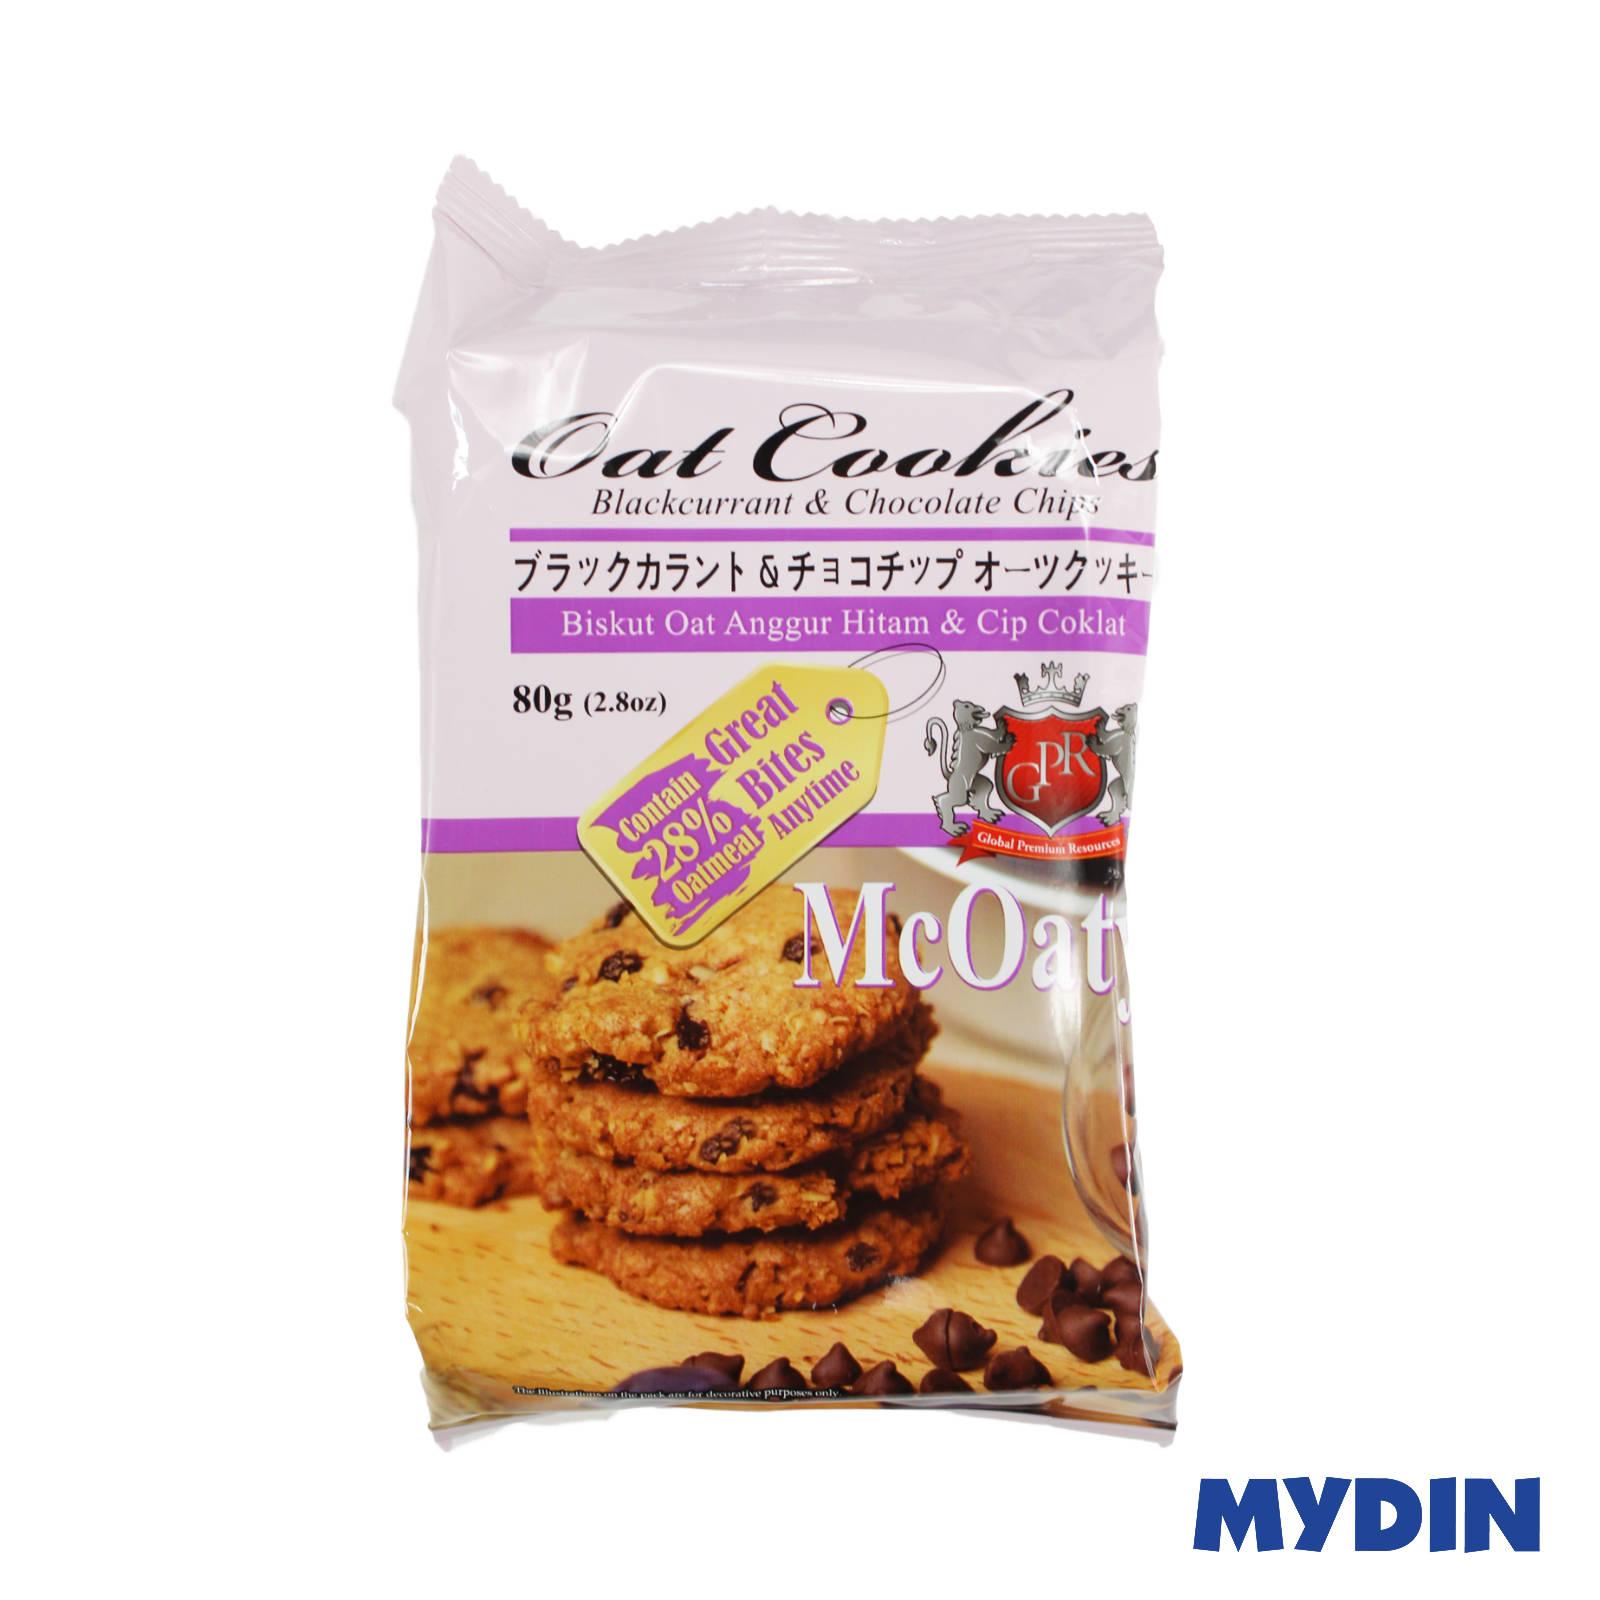 GPR McOaty Blackcurrant & Chocolate Chips Oat Cookies 80g